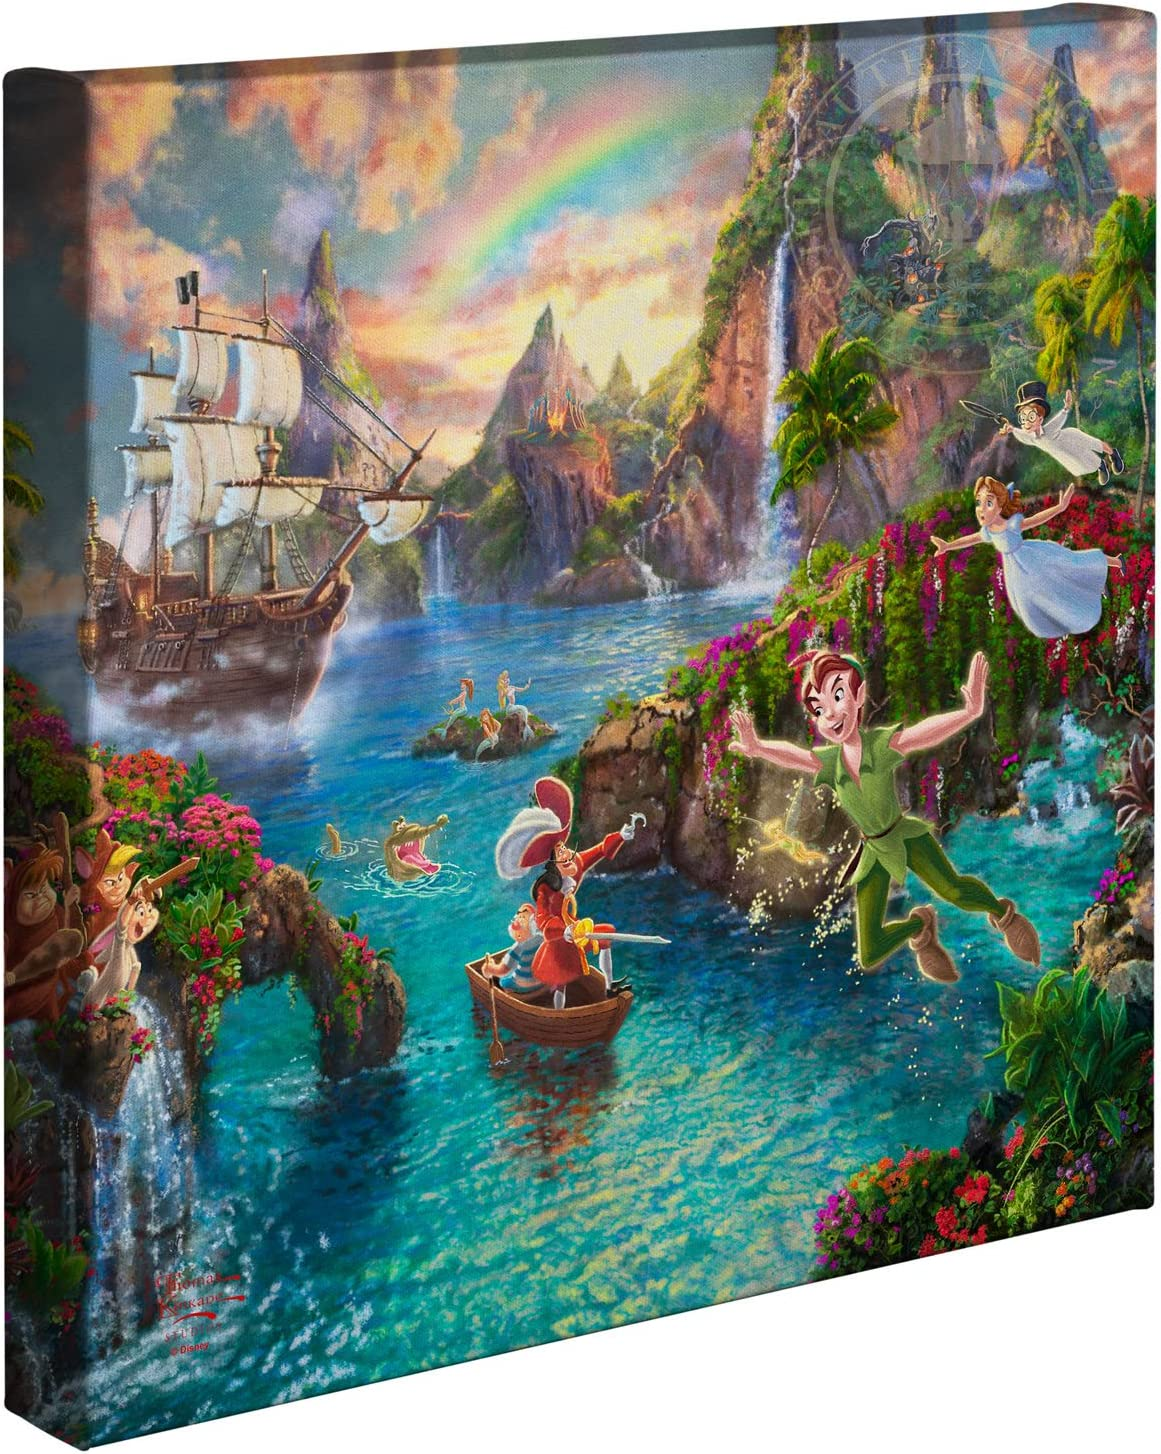 Thomas Kinkade Studios Disney Dumbo 14 x 14 Gallery Wrapped Canvas